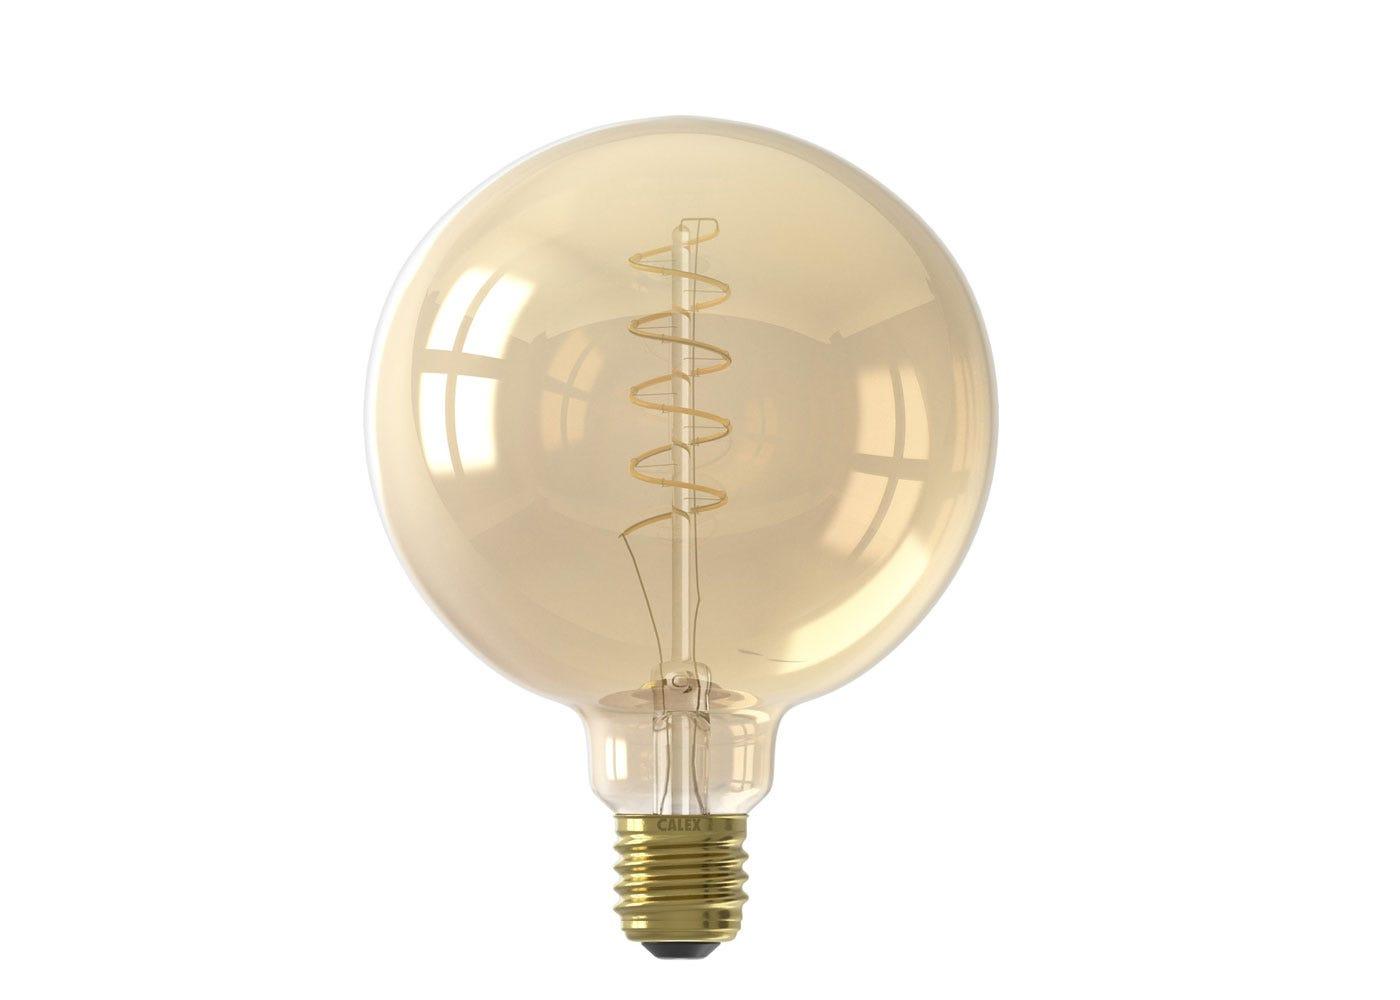 As shown: Globe Spiral Filament Gold Large Bulb 4W E27 LED